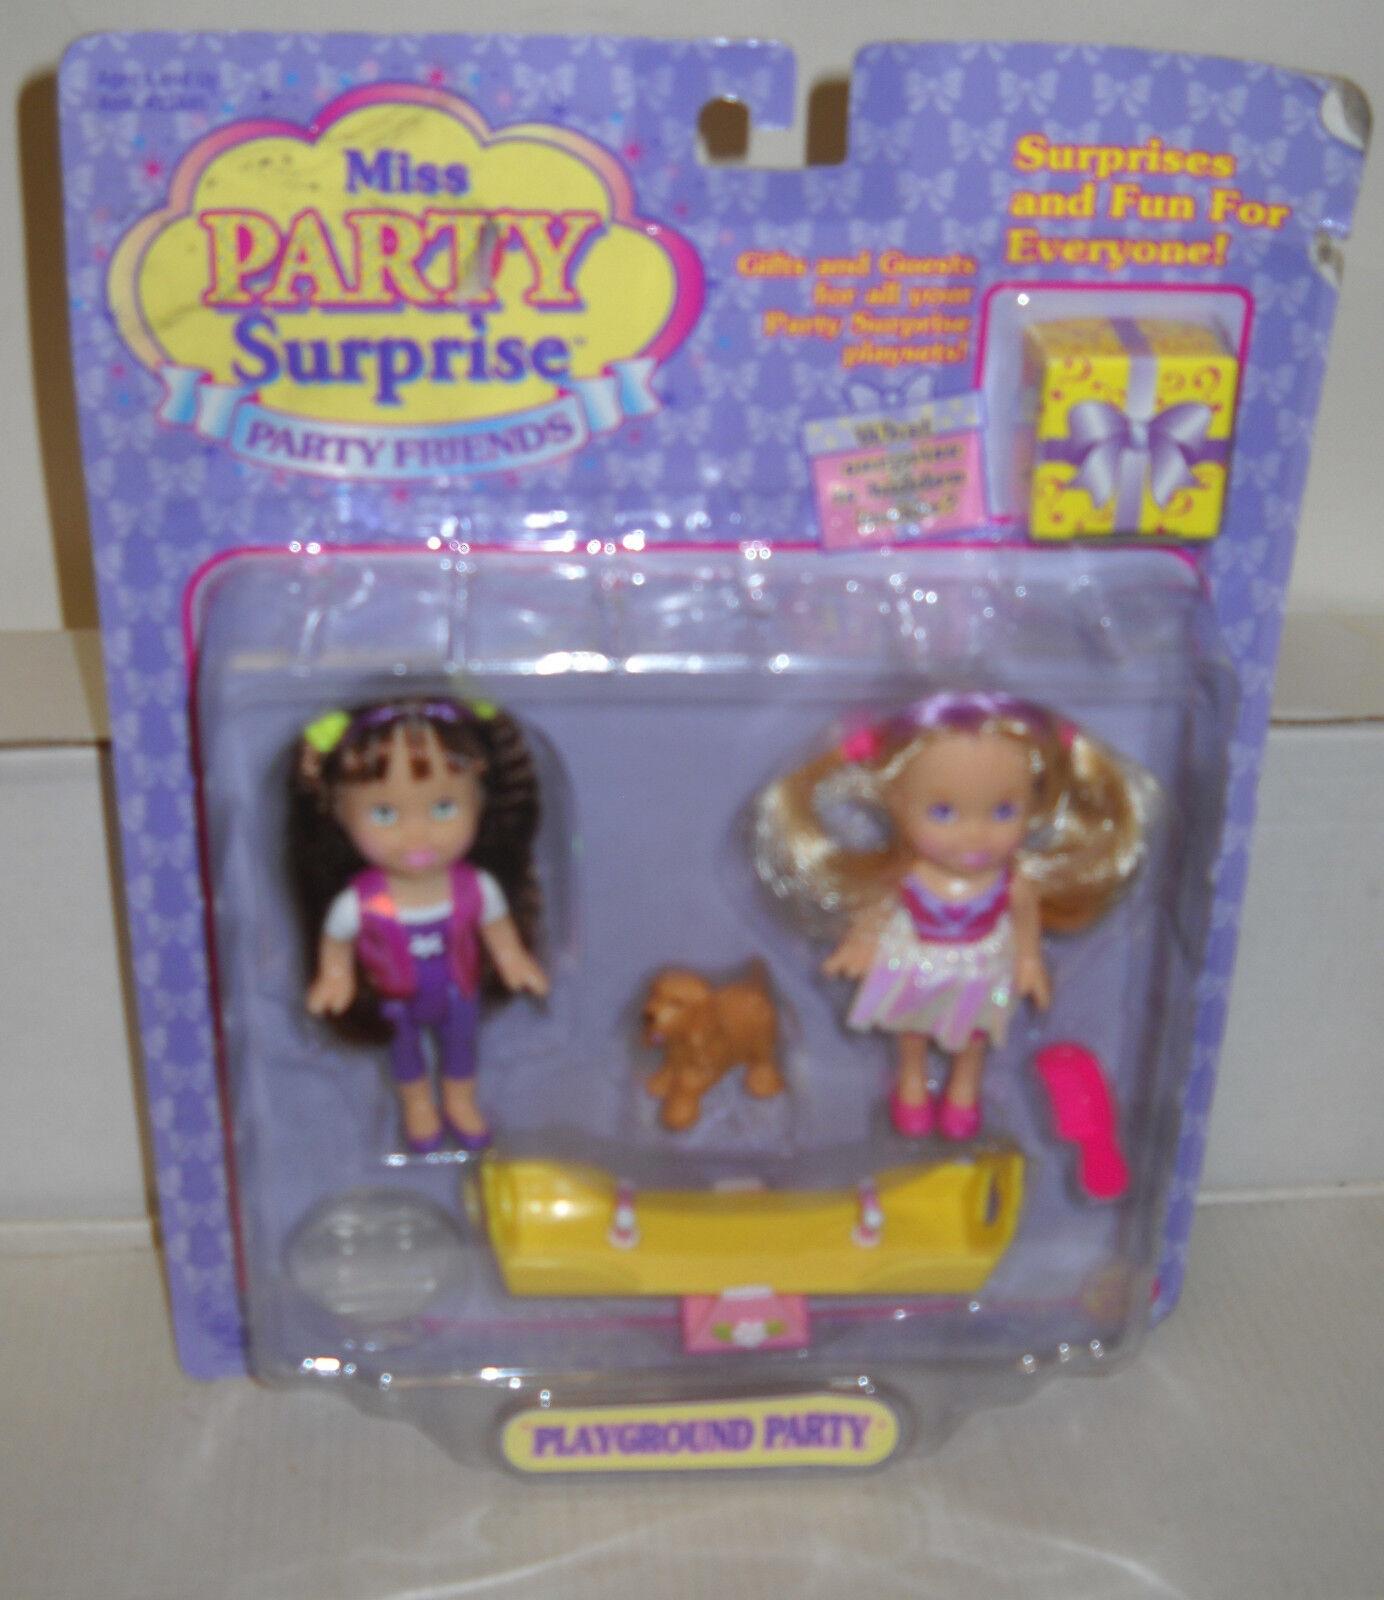 Raro nrfc Toy Biz Miss fiesta fiesta sorpresa muñecas Amigos Parque Infantil Fiesta